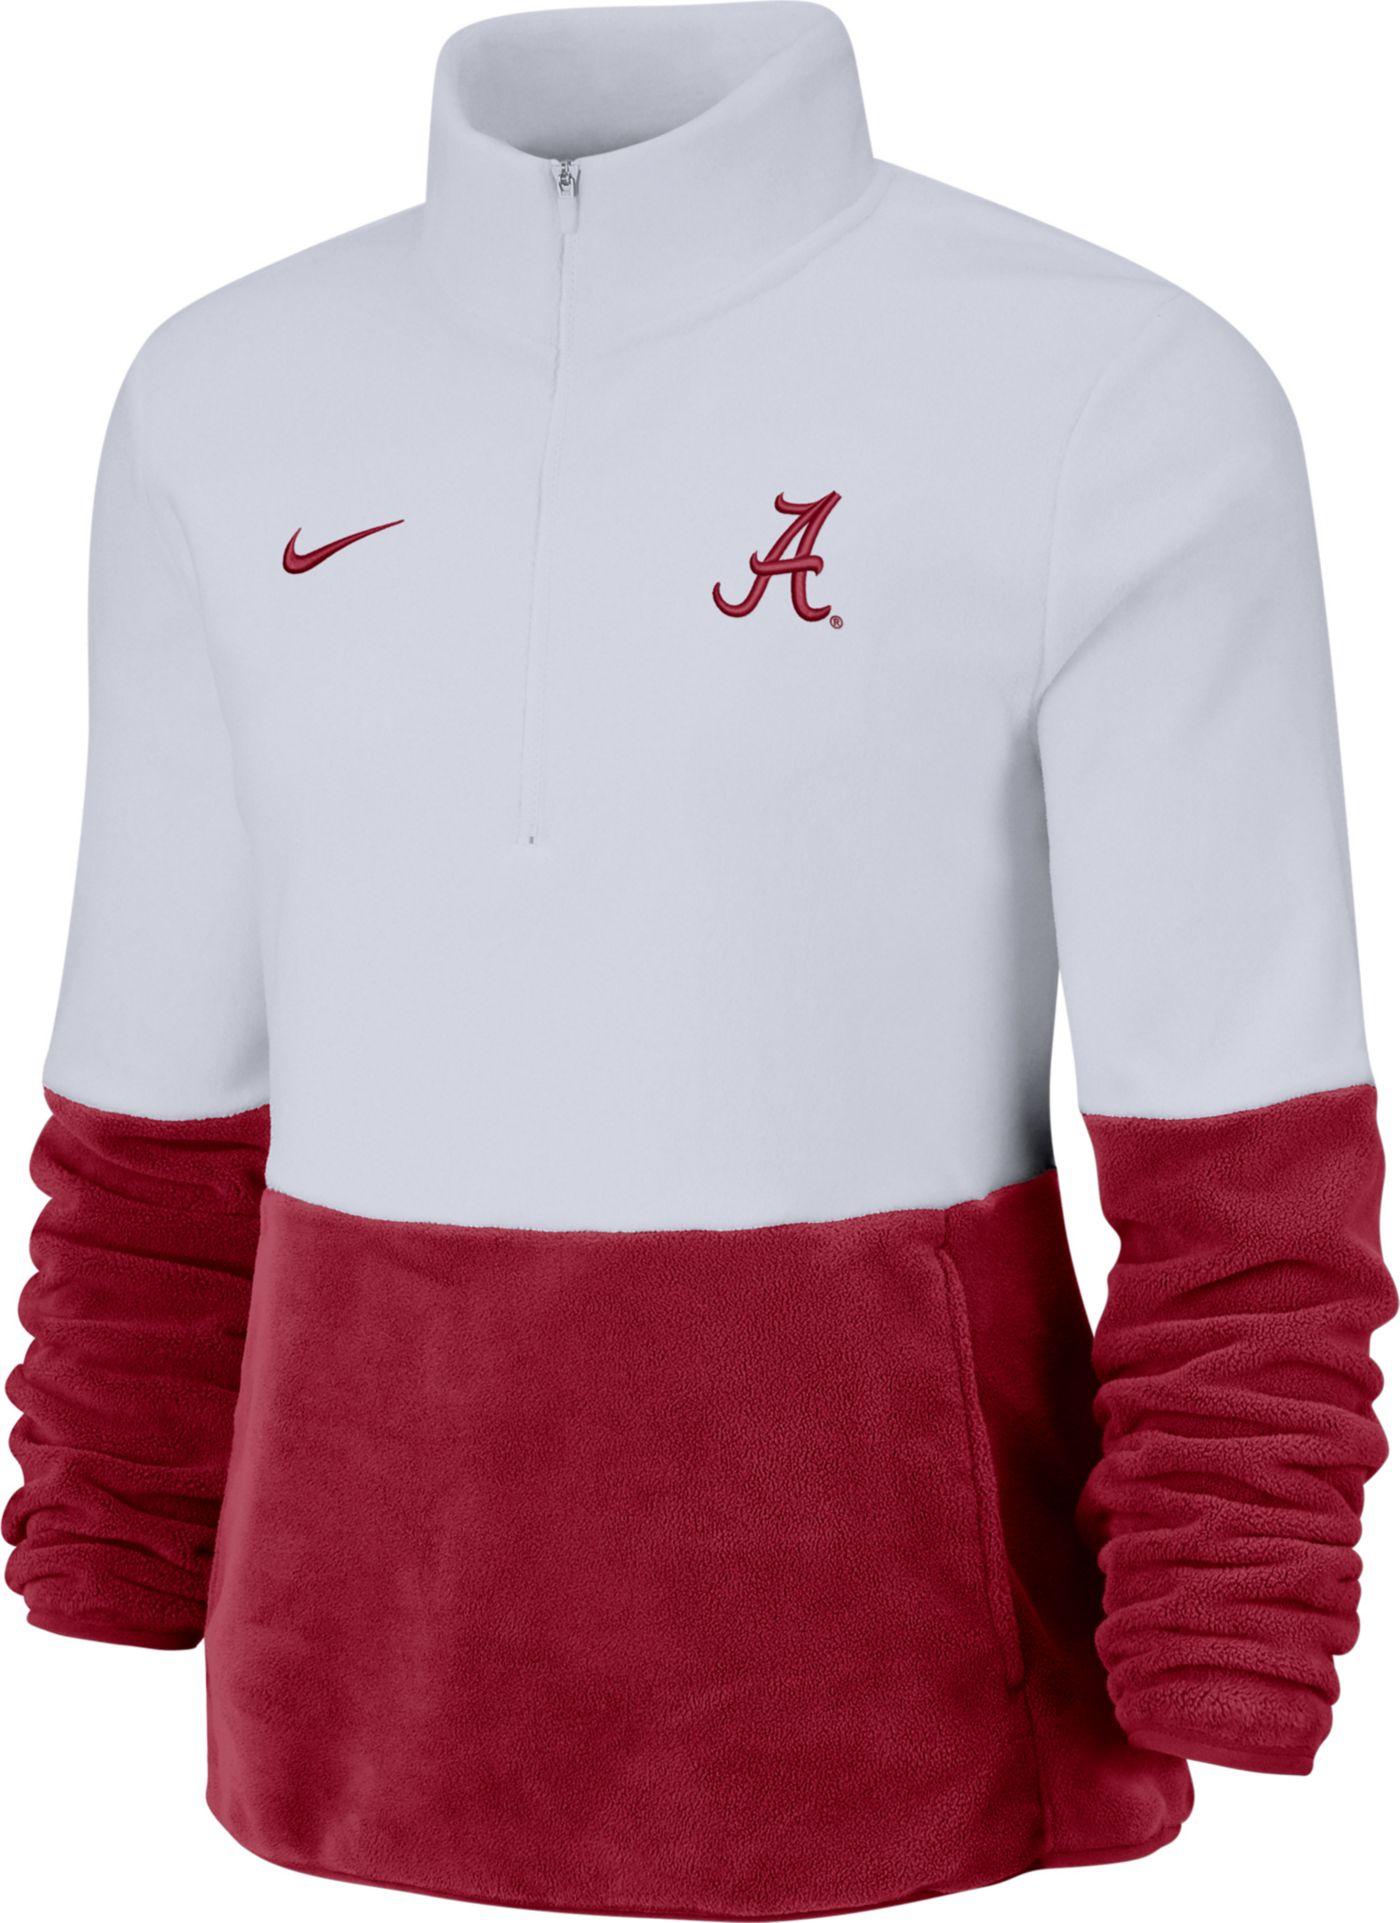 Nike Women's Alabama Crimson Tide Cozy Therma White Half-Zip Fleece